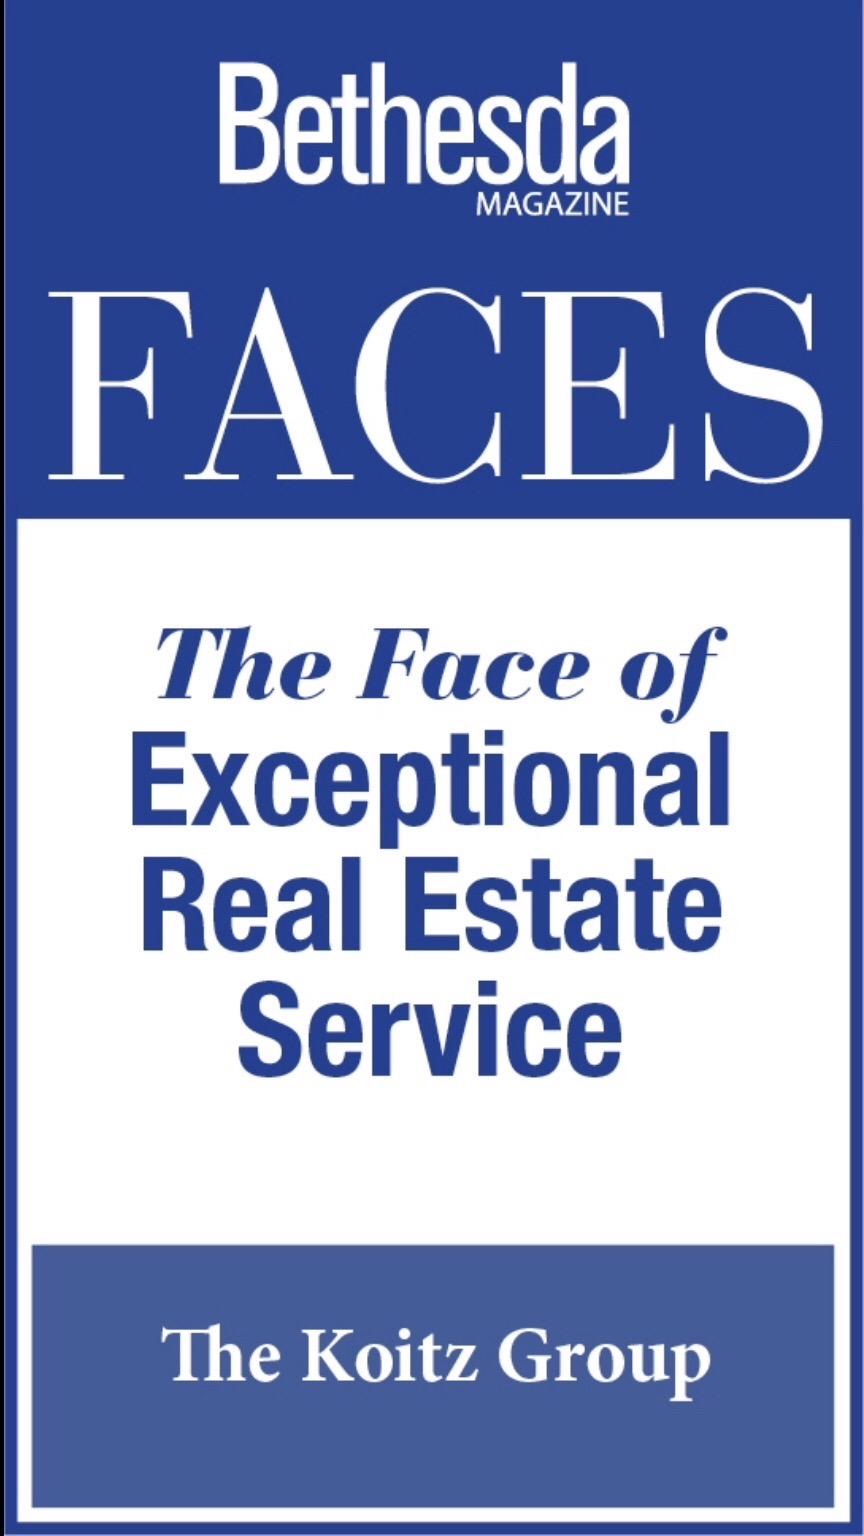 Bethesda Magazine Koitz Group: Faces of Exceptional Real Estate Service